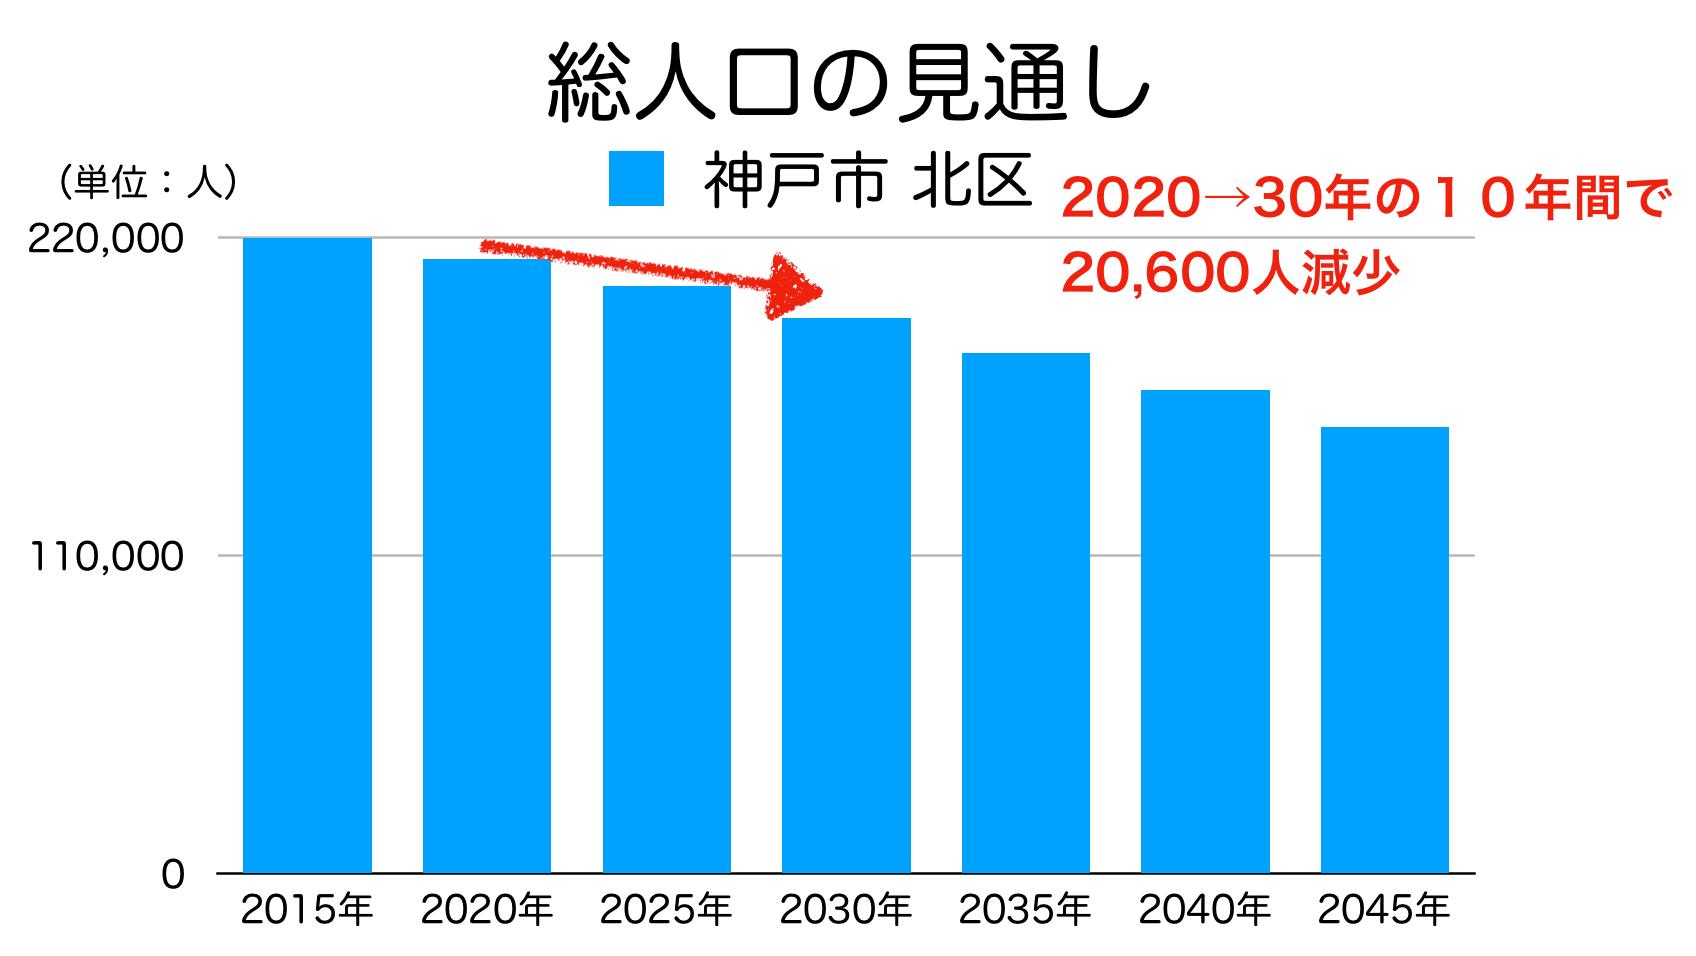 神戸市北区の人口予測